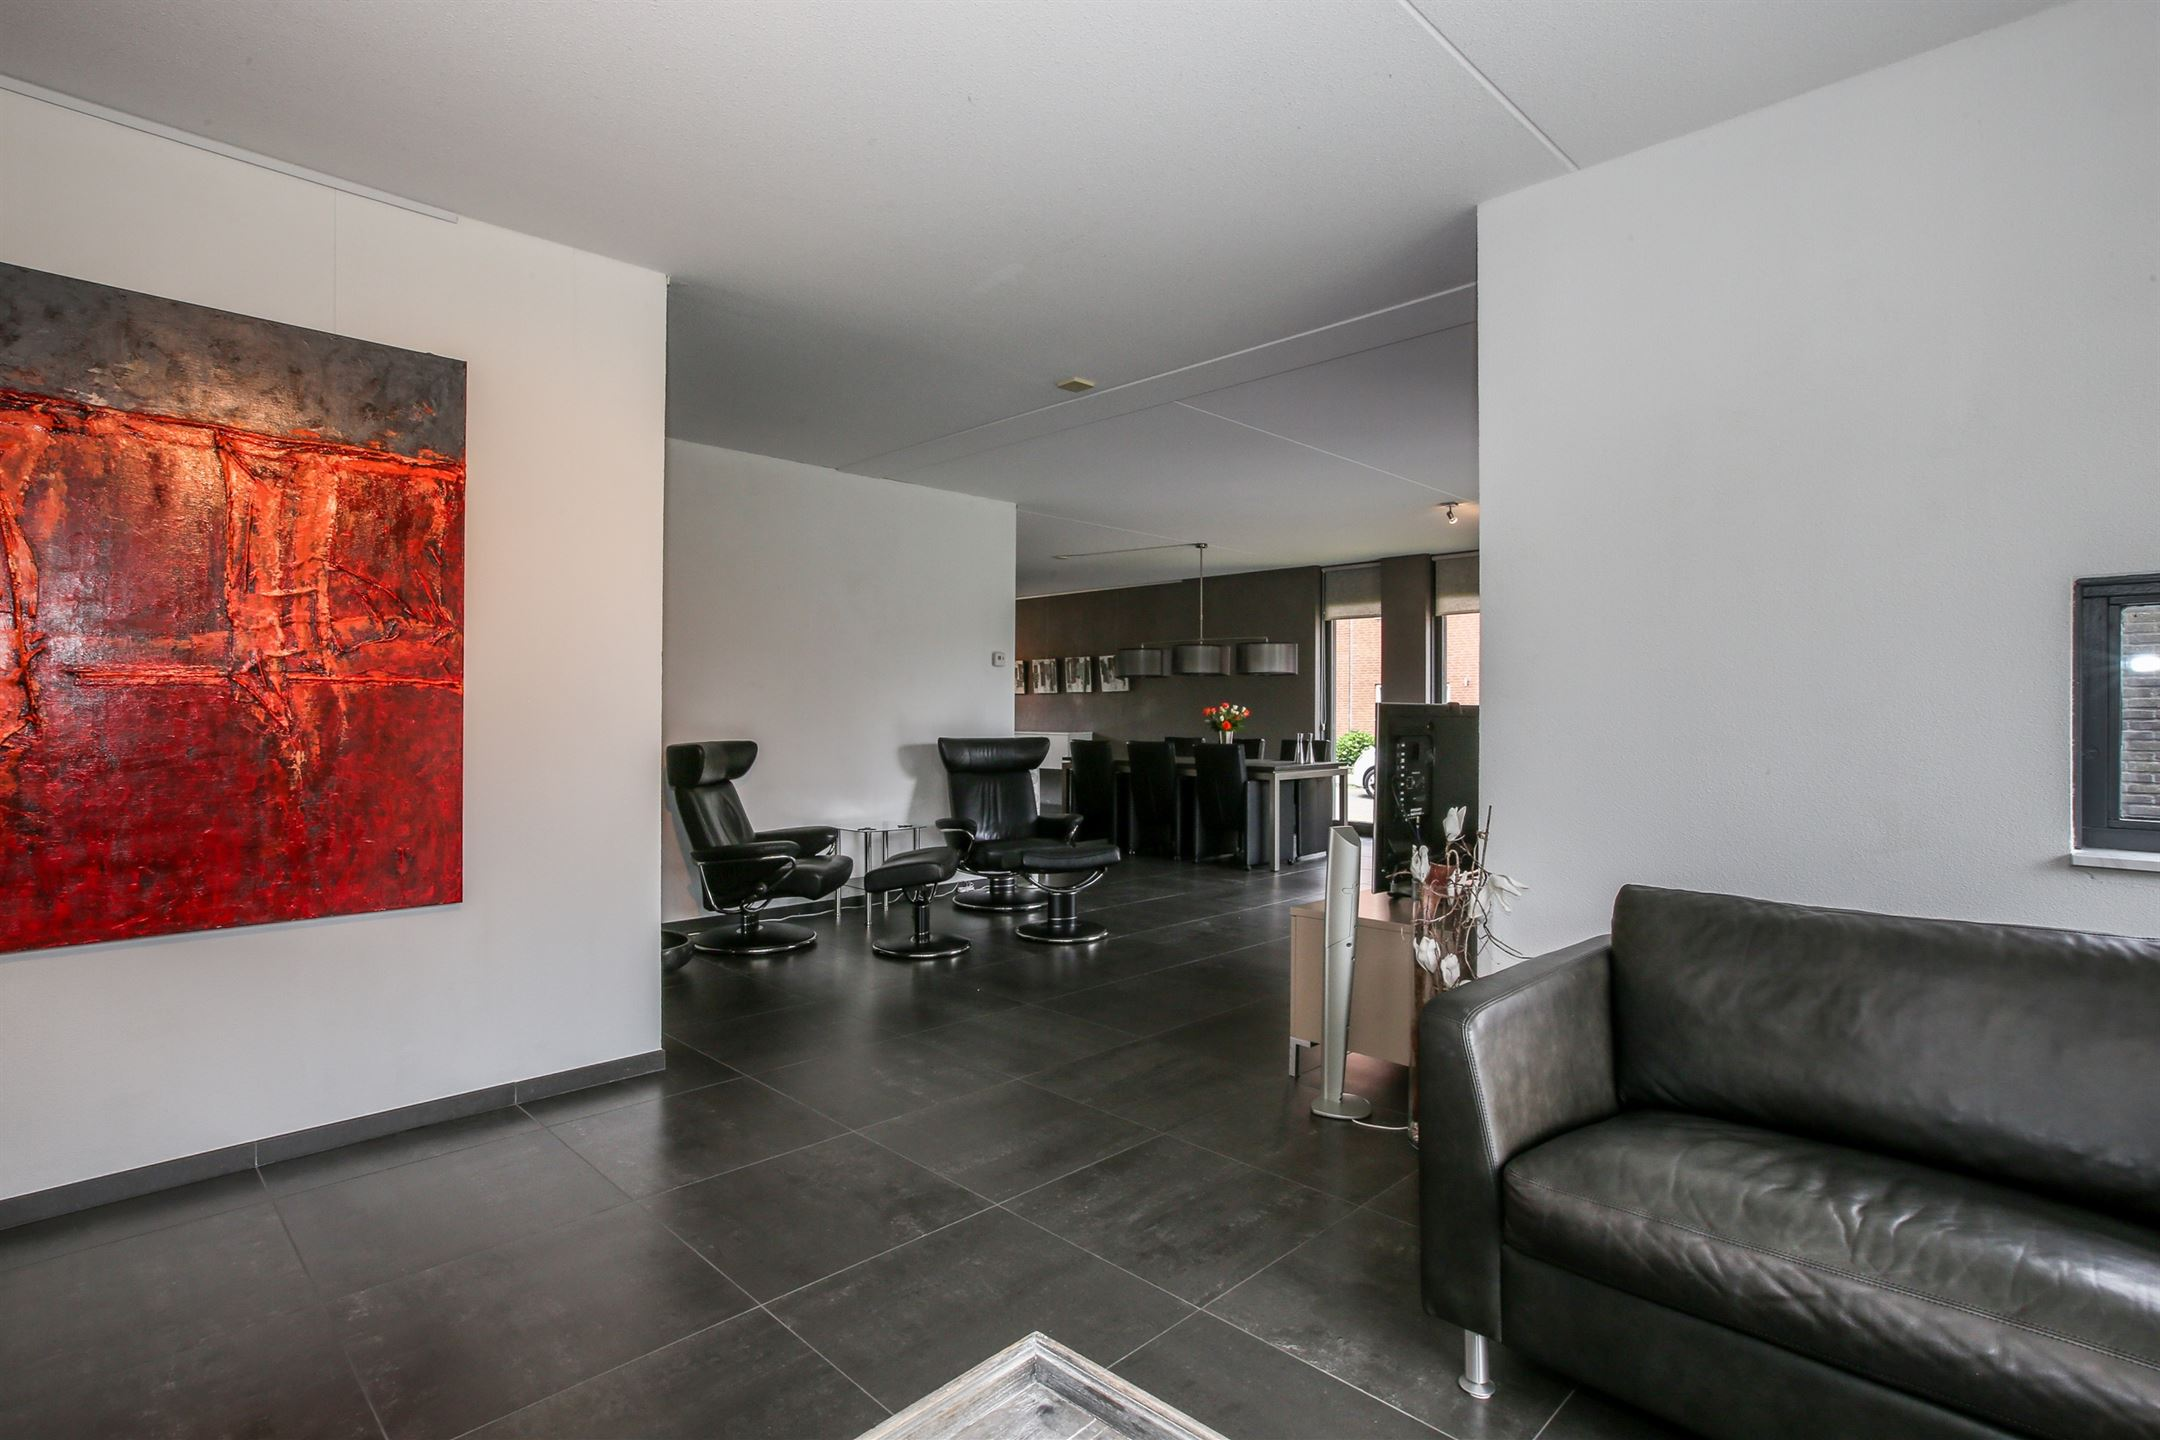 Huis te koop villa dotterbloem aa waalwijk funda